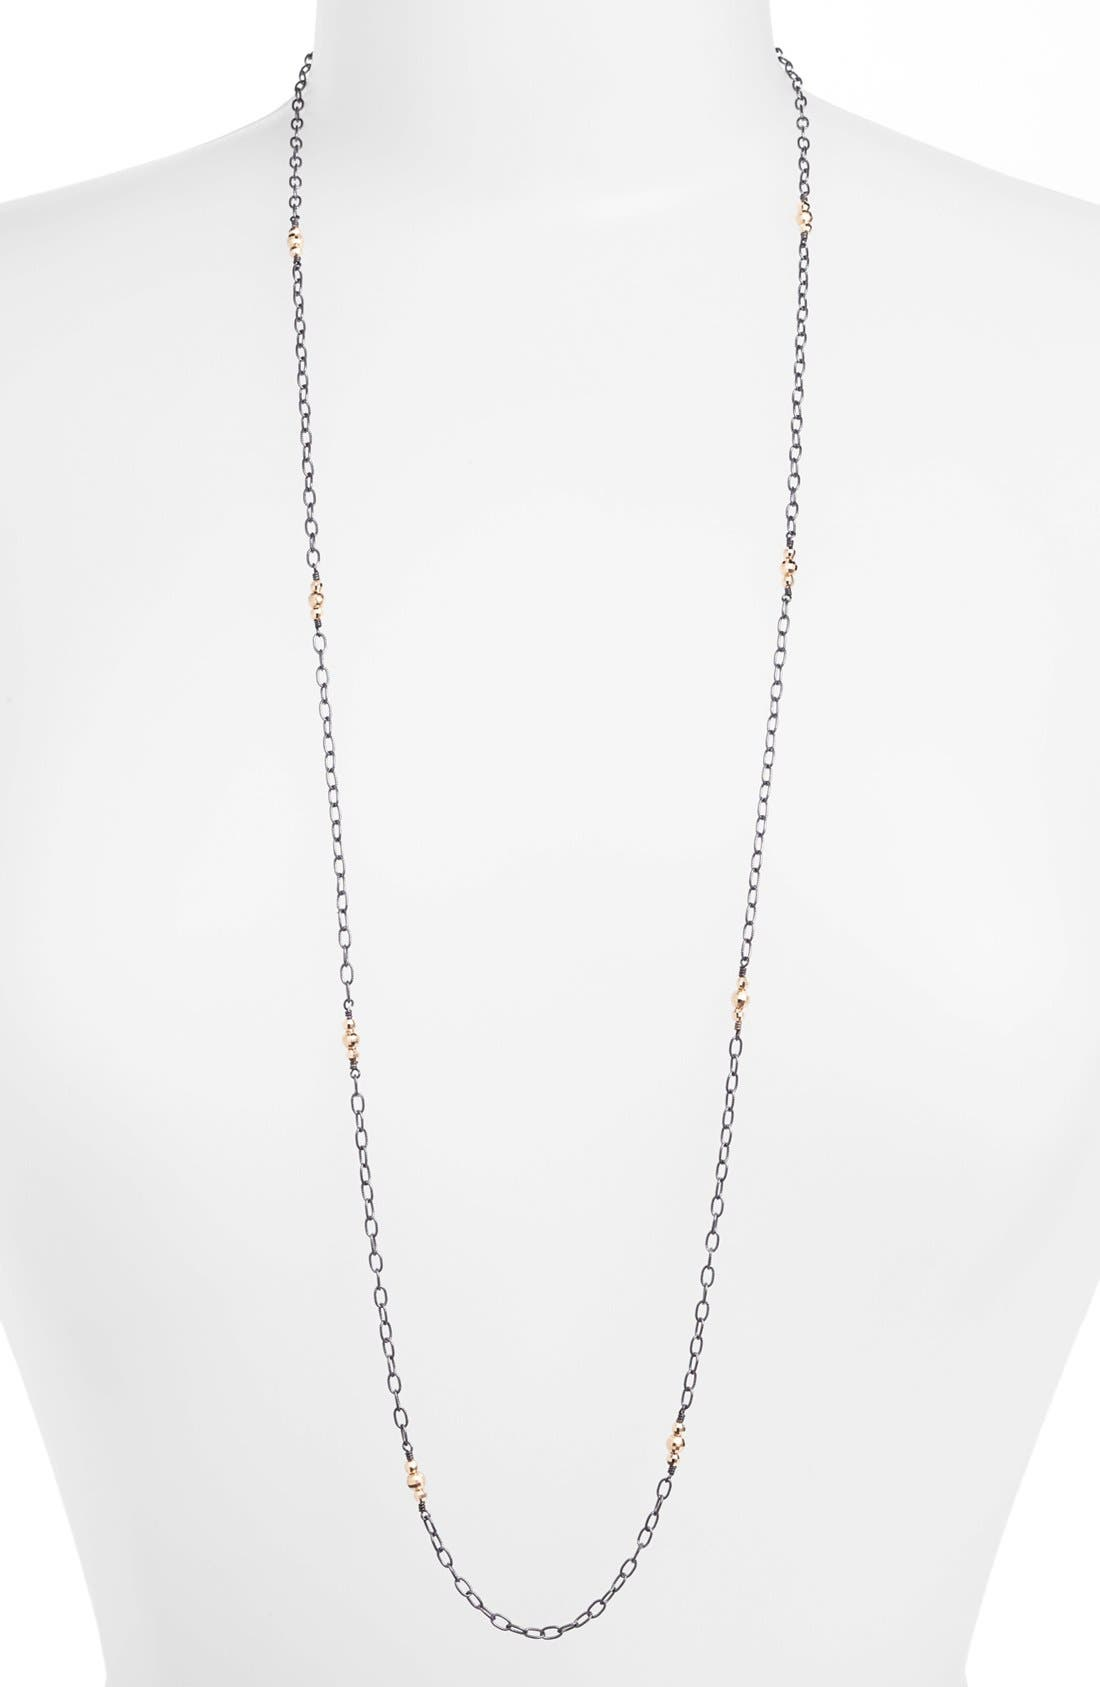 Alternate Image 1 Selected - Mizuki 'Cut Beads' Long Station Necklace